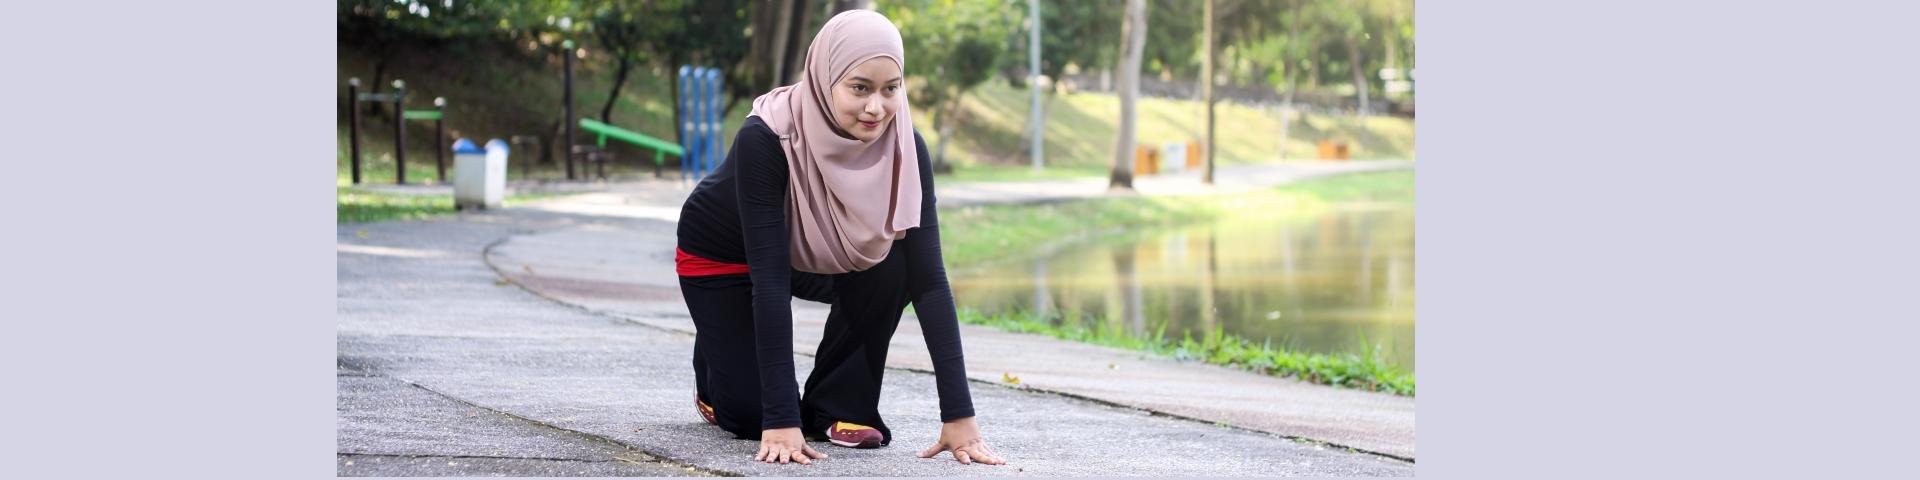 asian-lady-preparing-to-run